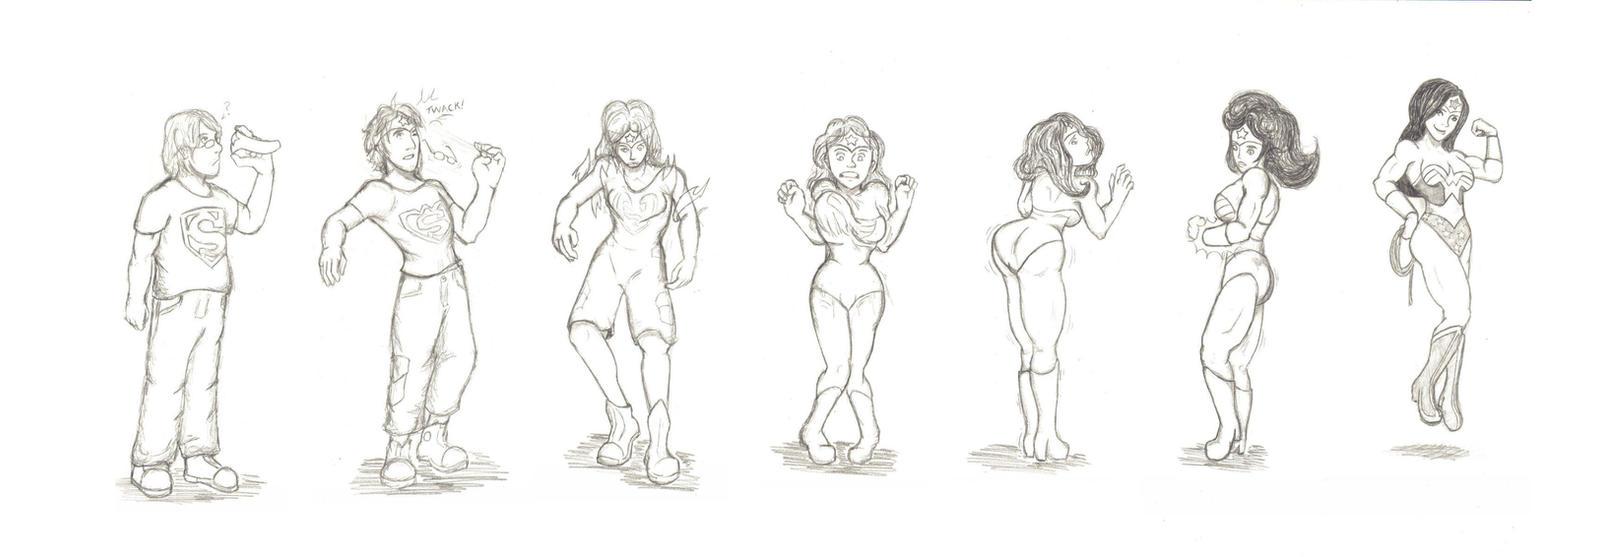 Wonder Woman TG Sequence by FieryJinx